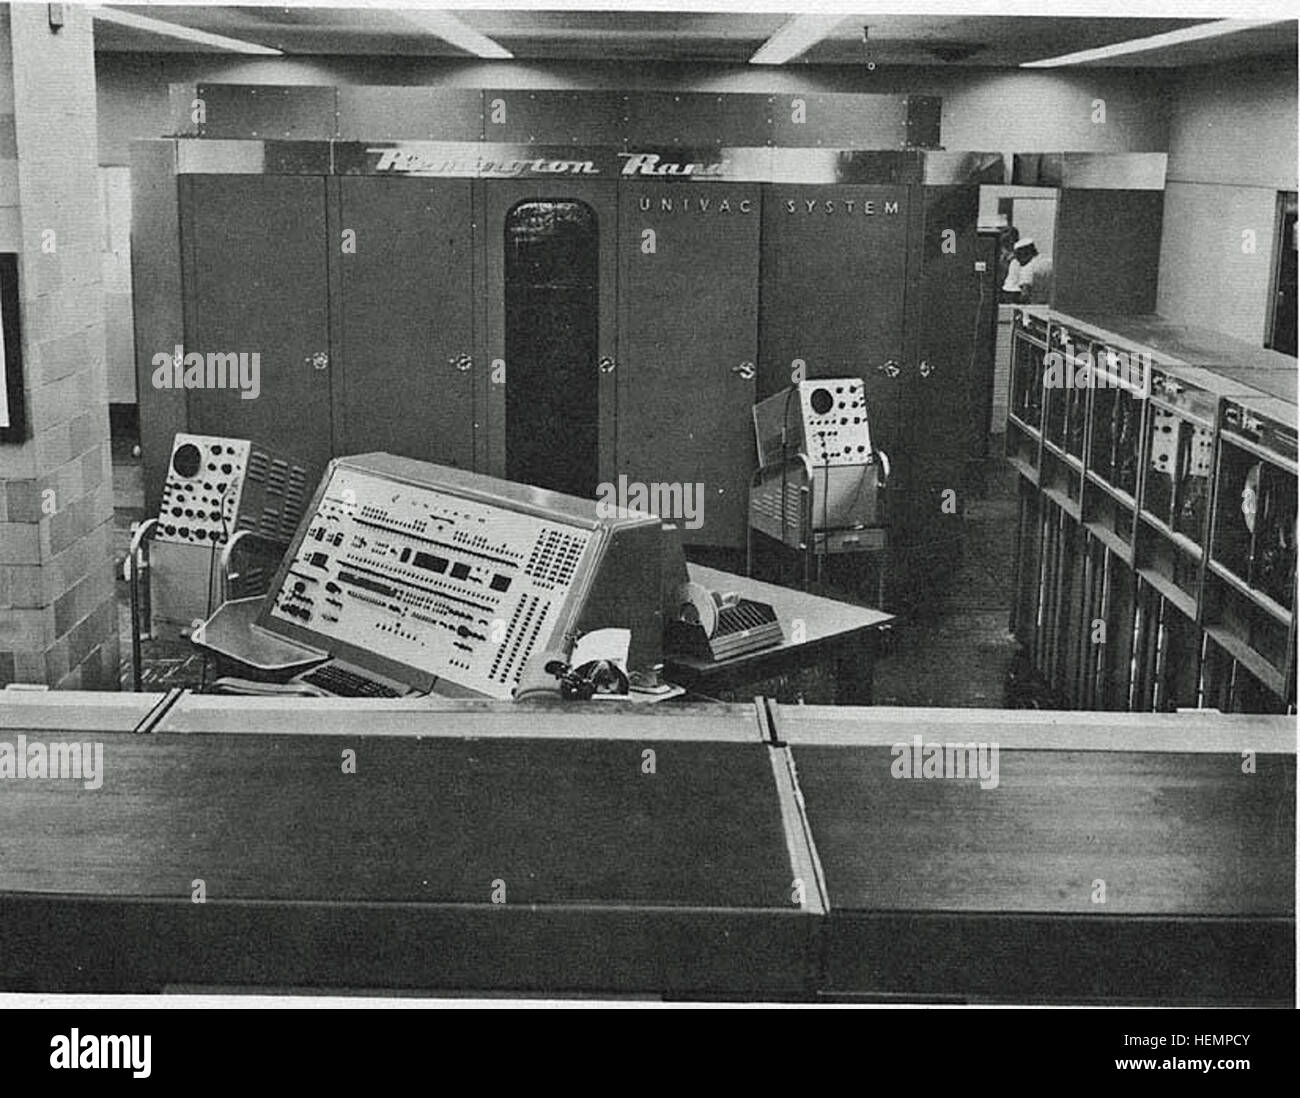 Univac-I-Navy-Electronics-Supply-Office-BRL61-0992 - Stock Image